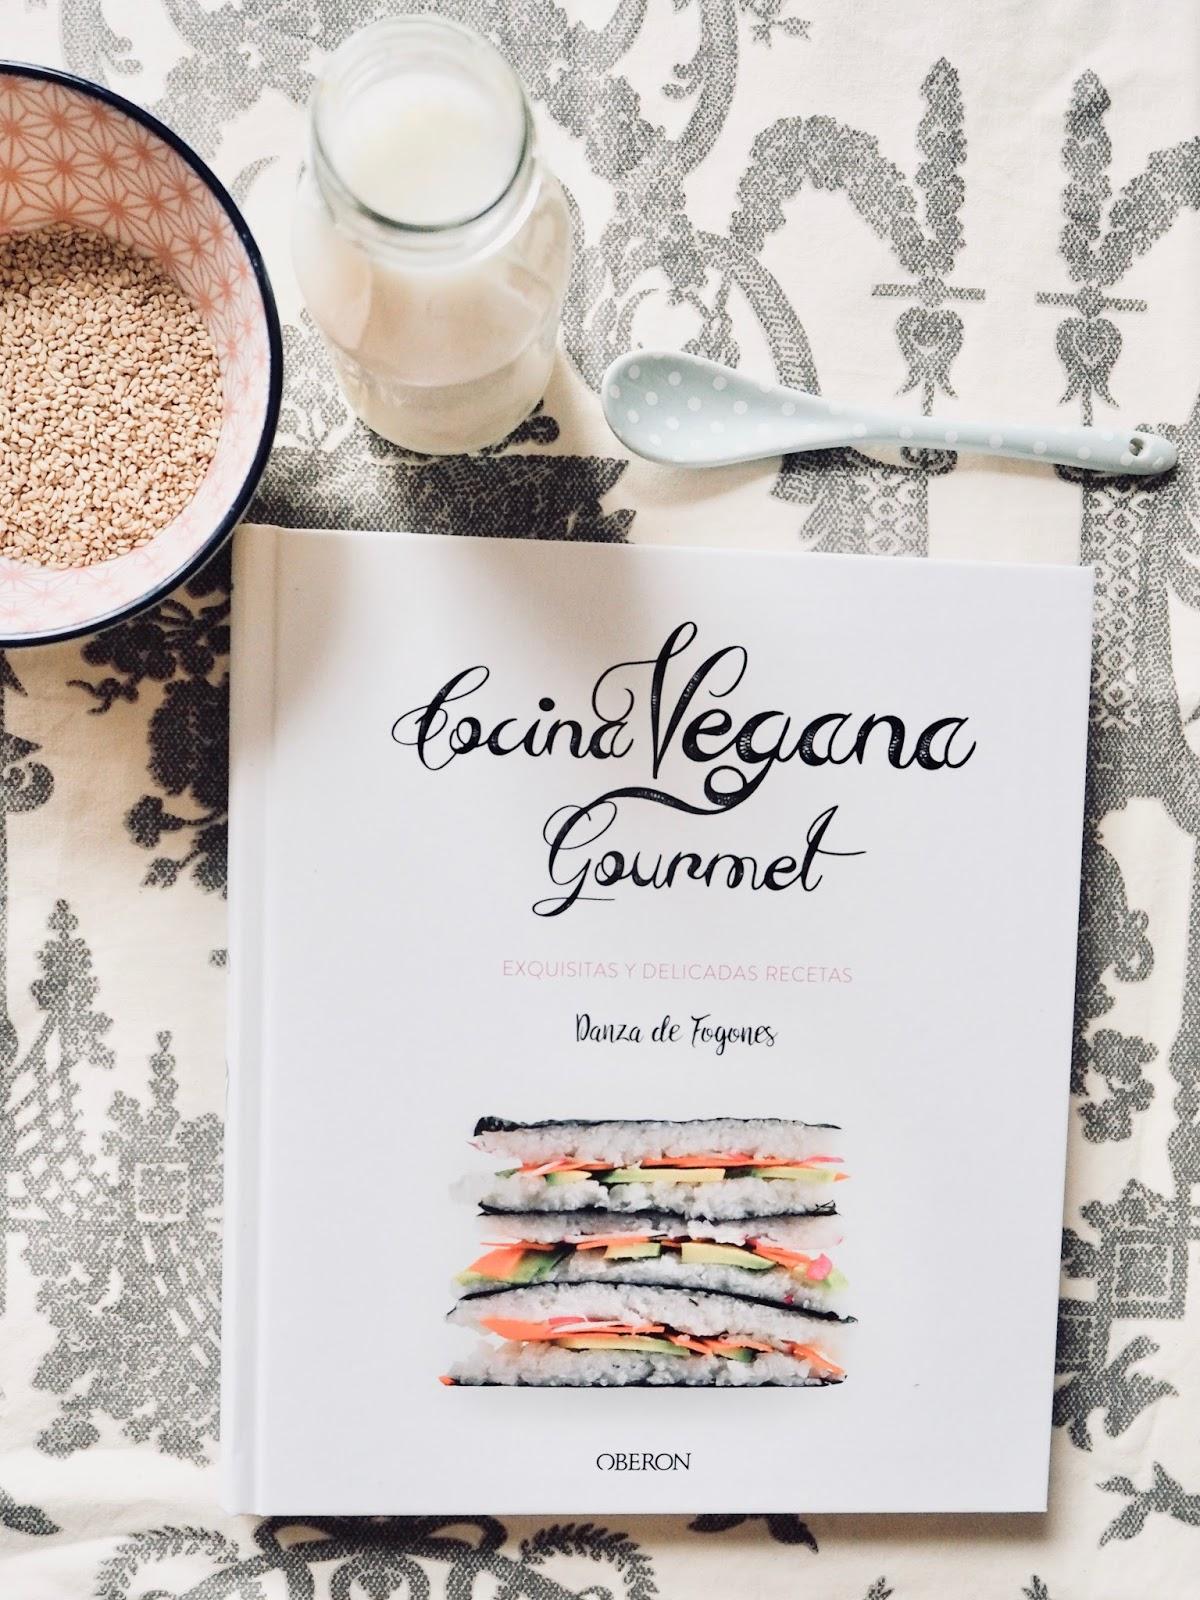 Maituins mai3 newcookingbooks for Cocina vegana gourmet